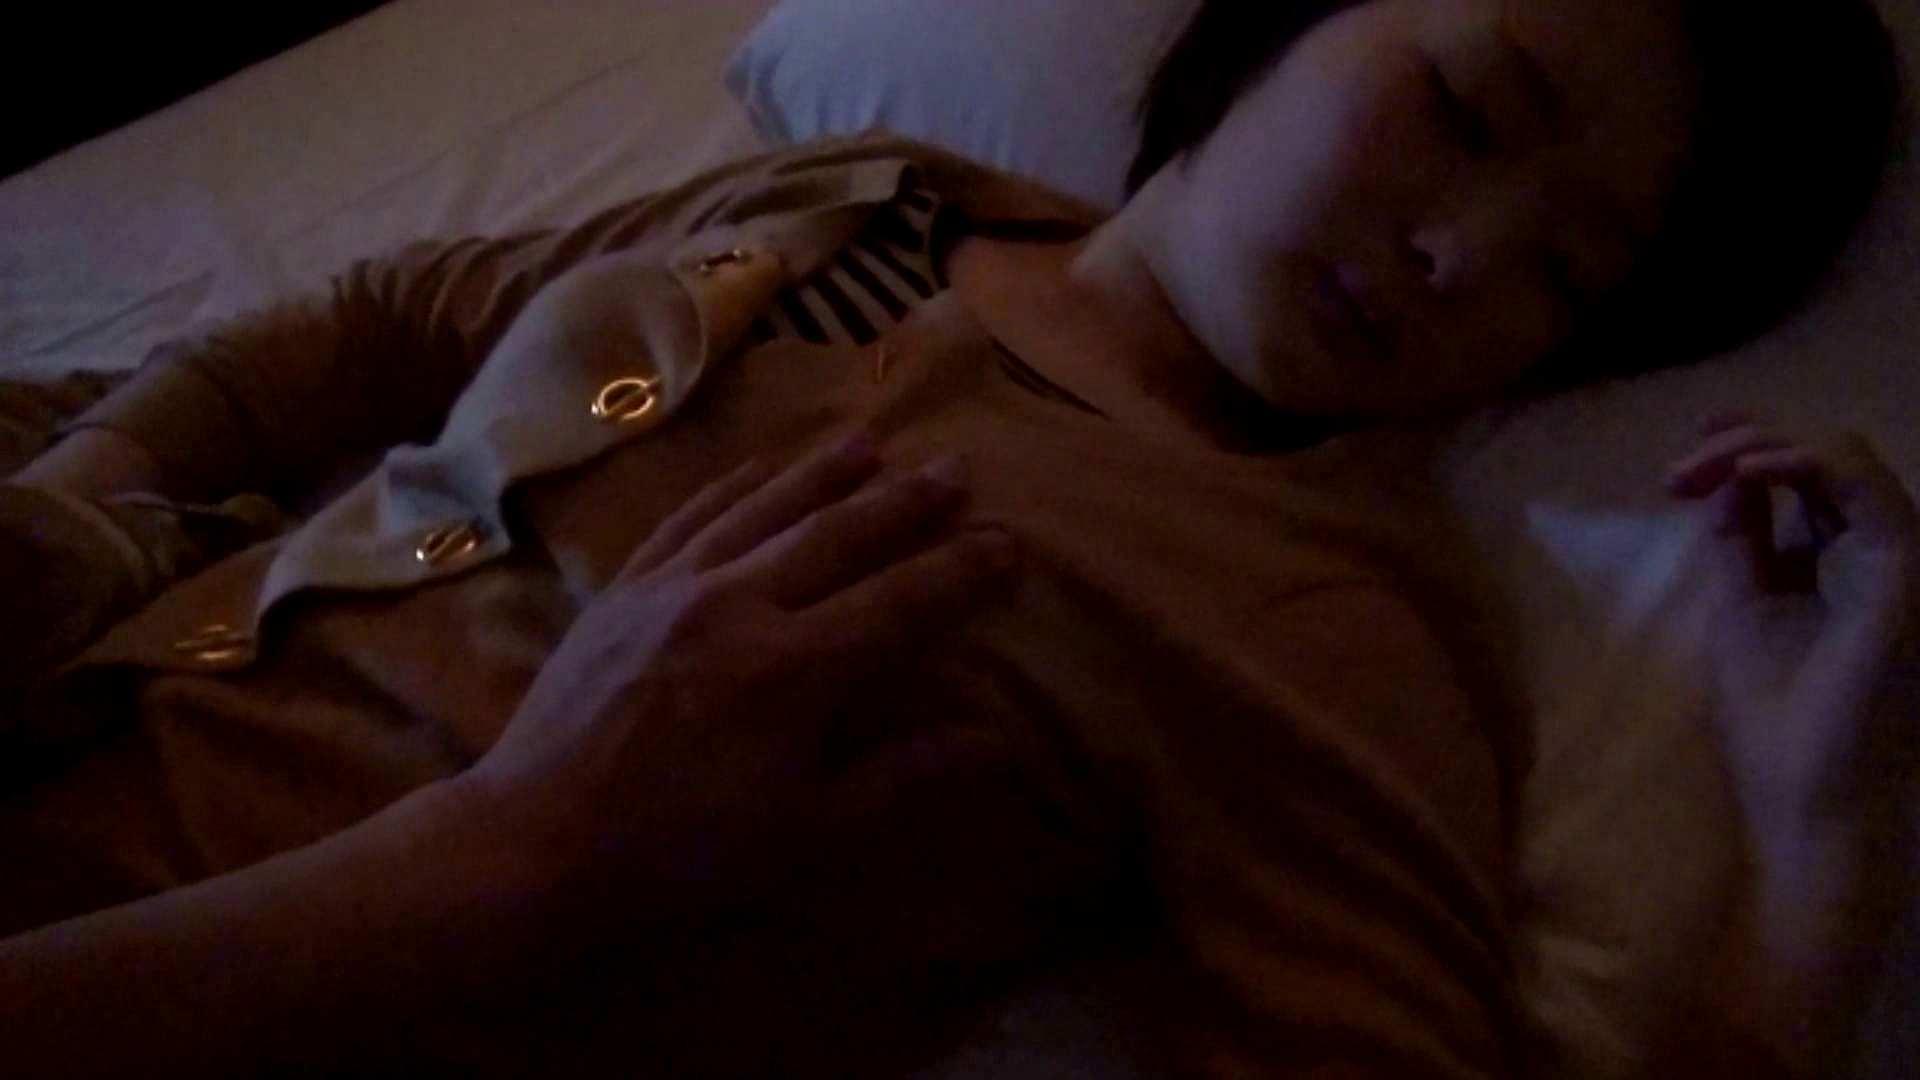 vol.31 【KTちゃん】現役JD居酒屋アルバイト 3回目? 美乳 アダルト動画キャプチャ 93枚 29